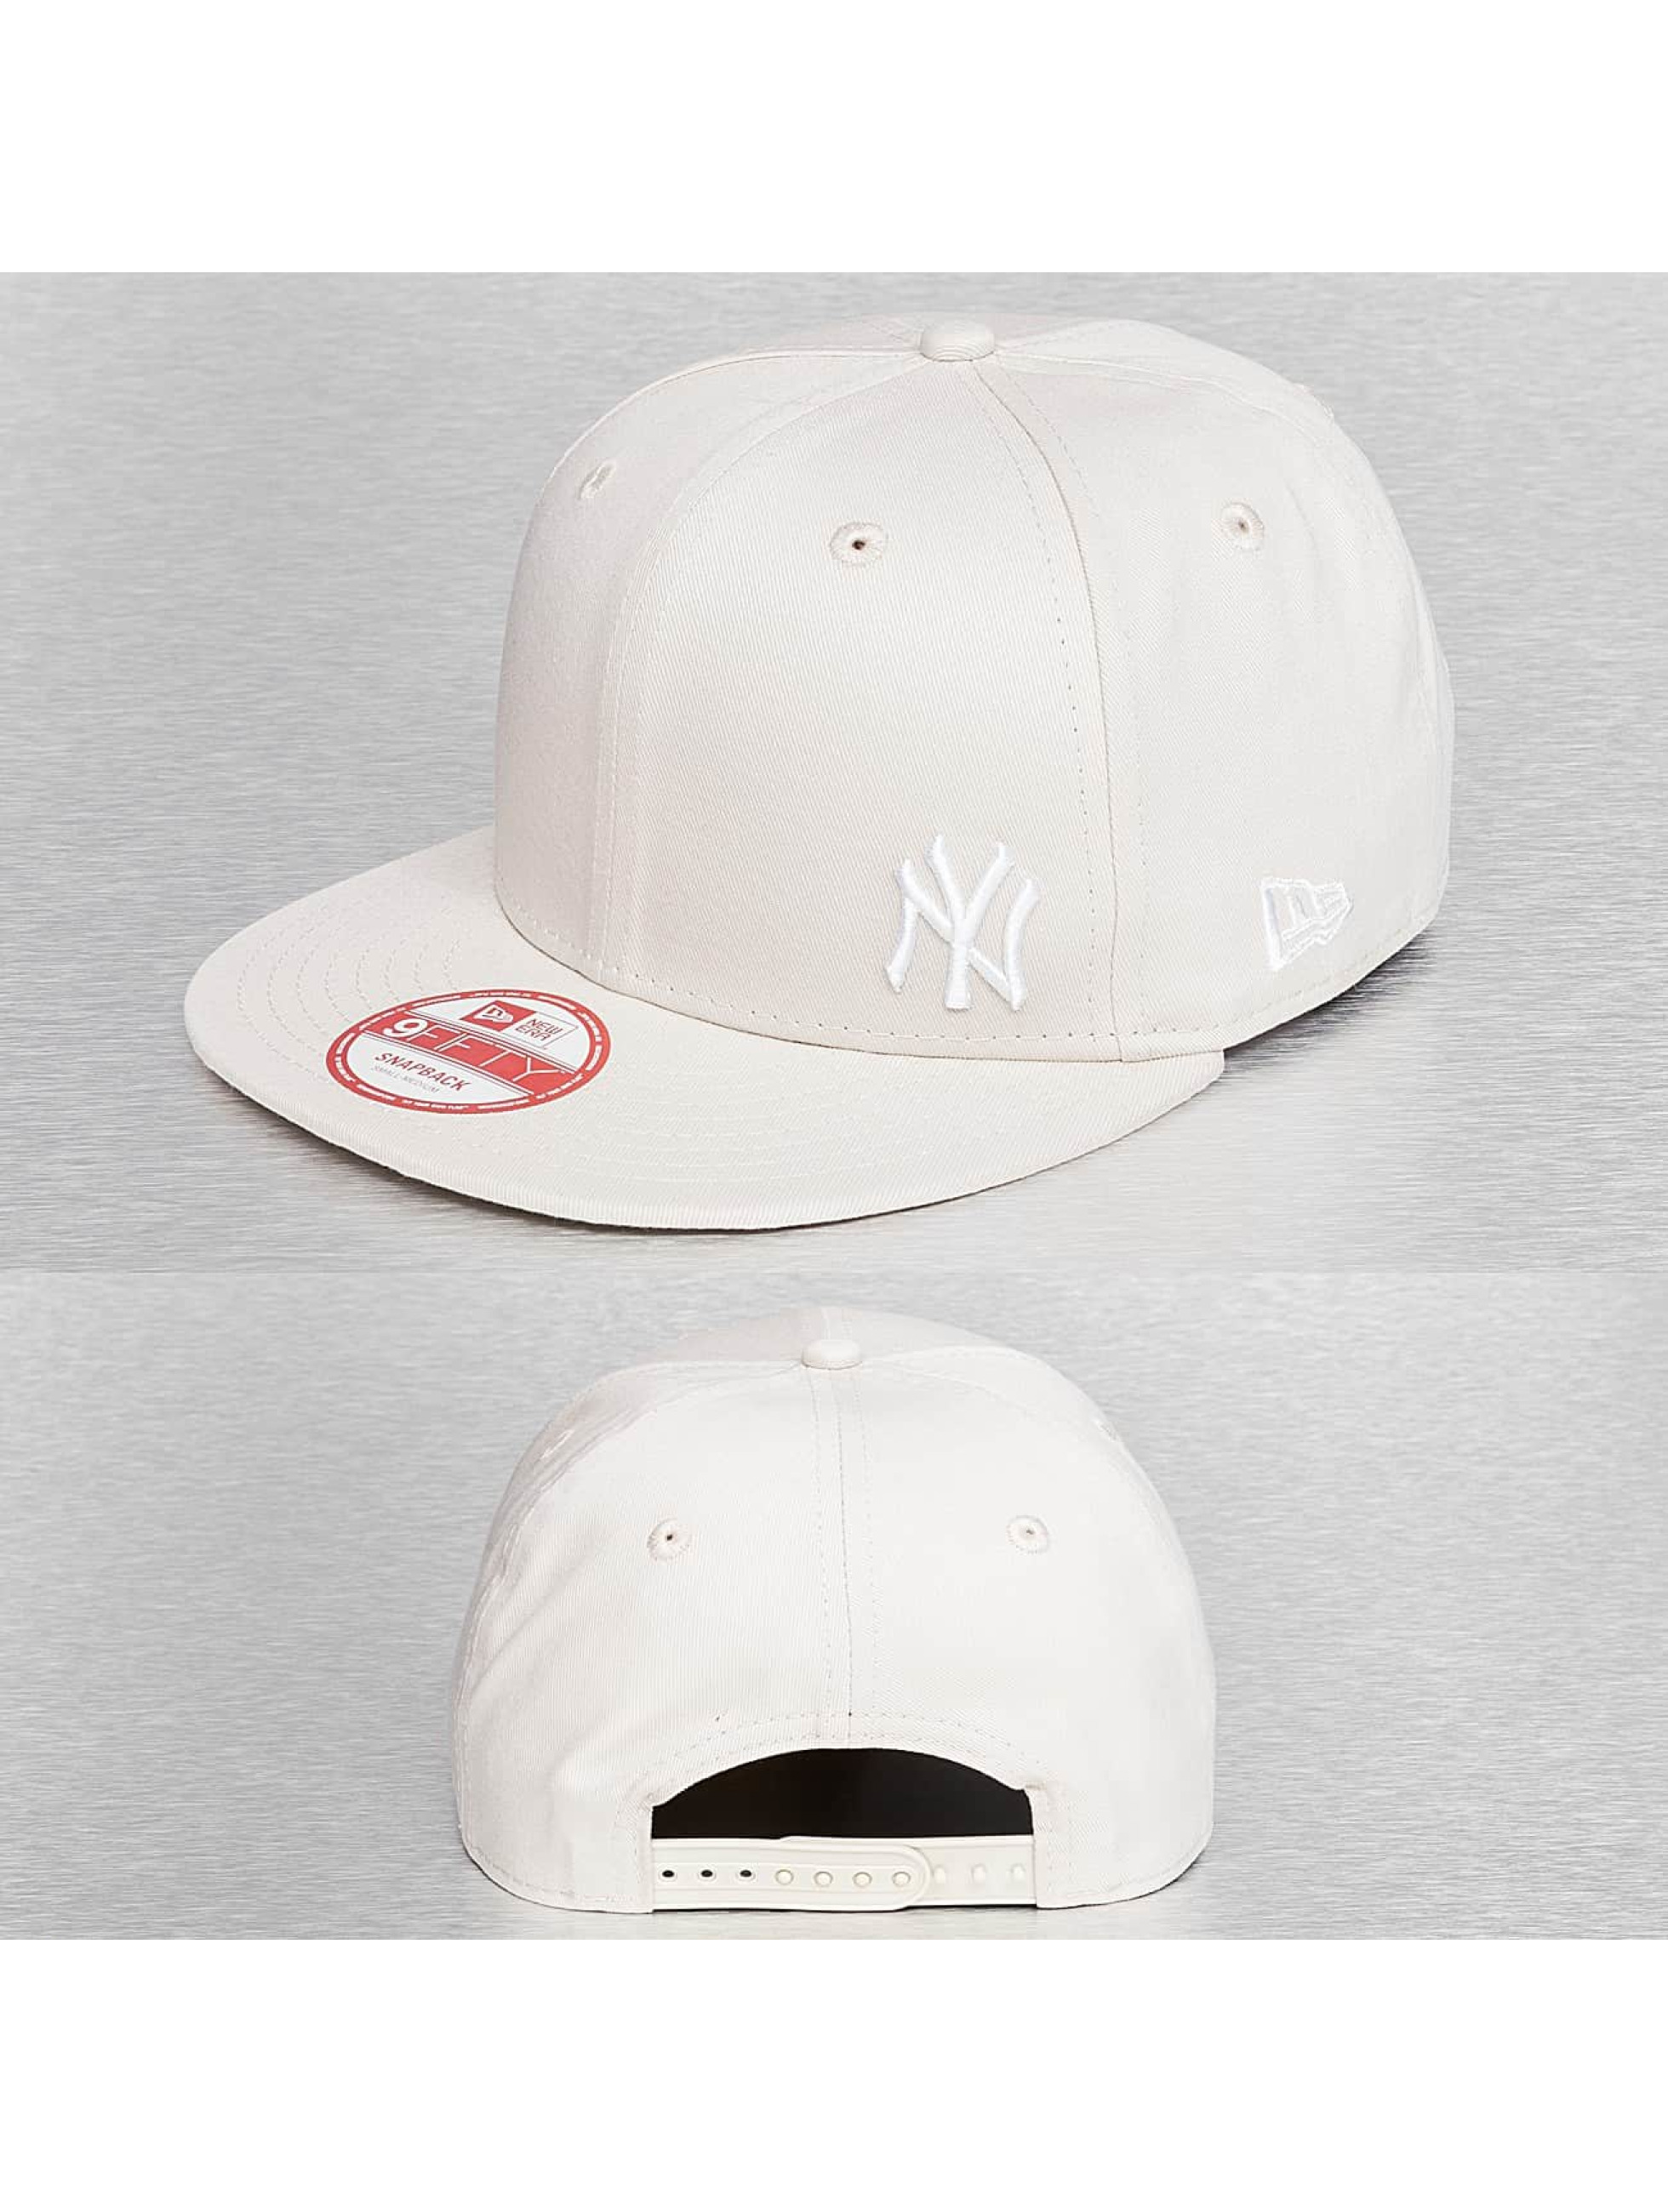 New Era Casquette Snapback & Strapback MLB Flawless NY Yankees beige